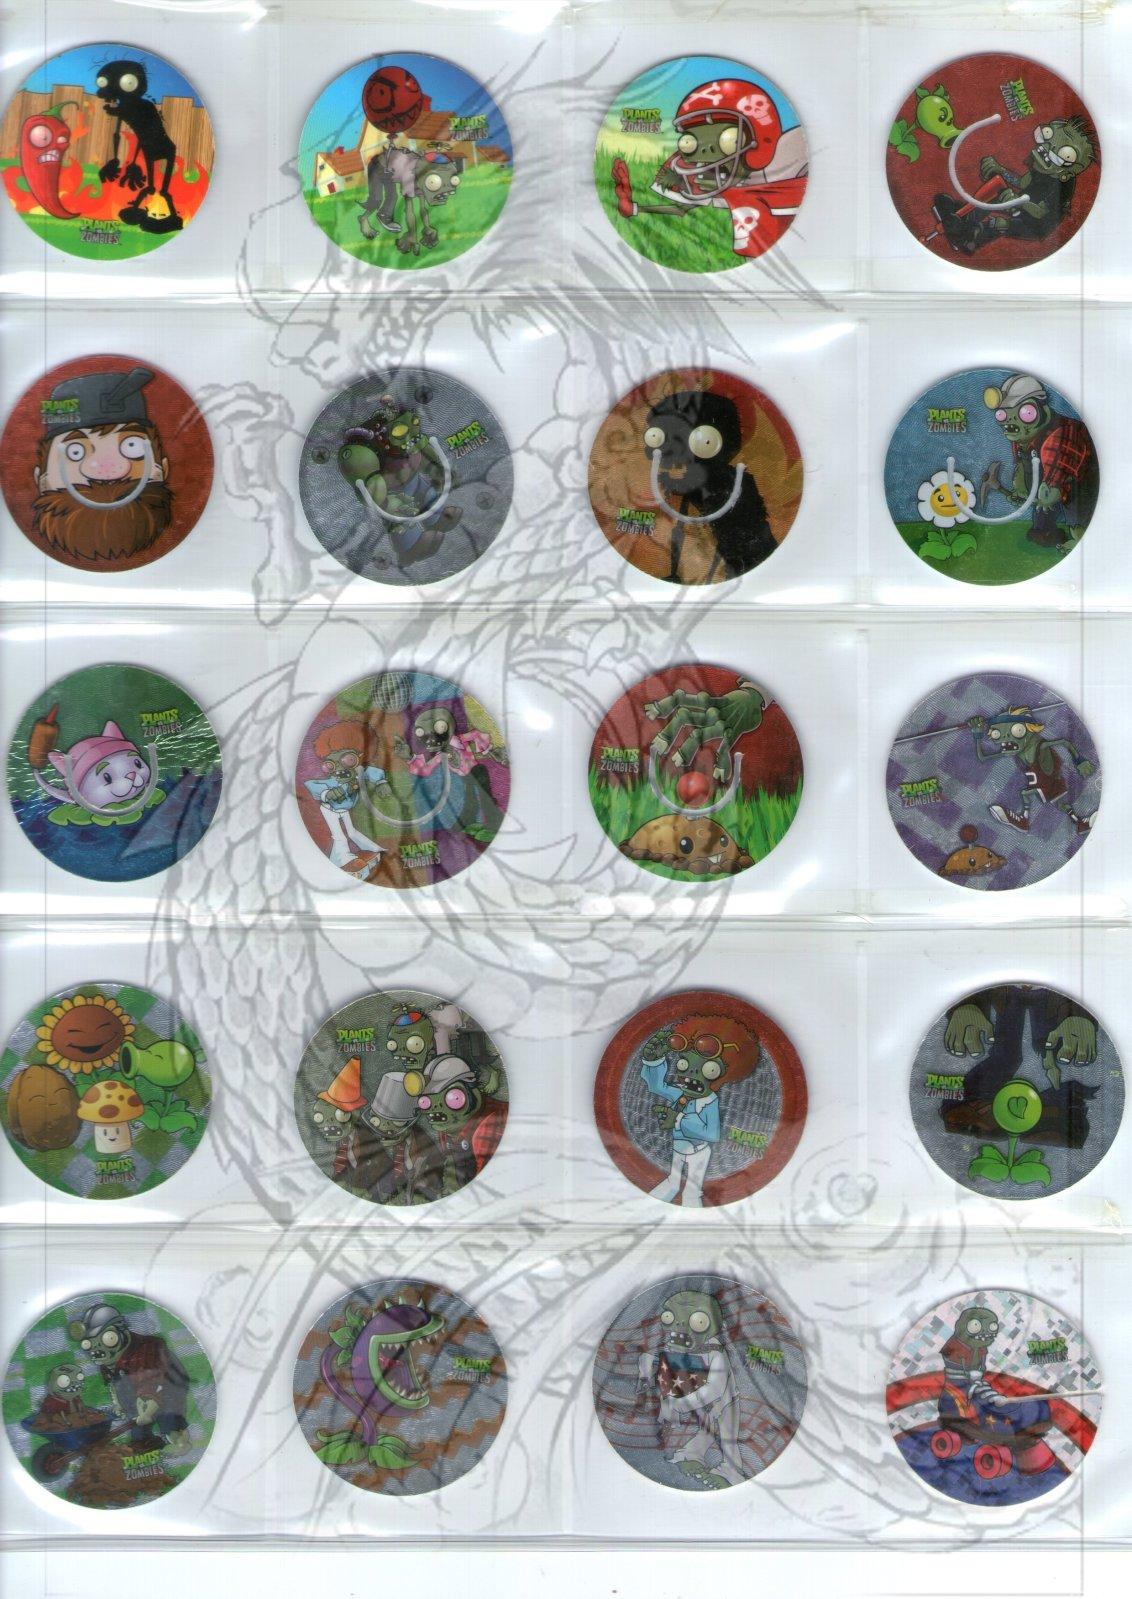 Tazos Plantas Vs Zombies de SABRITAS 2q15348